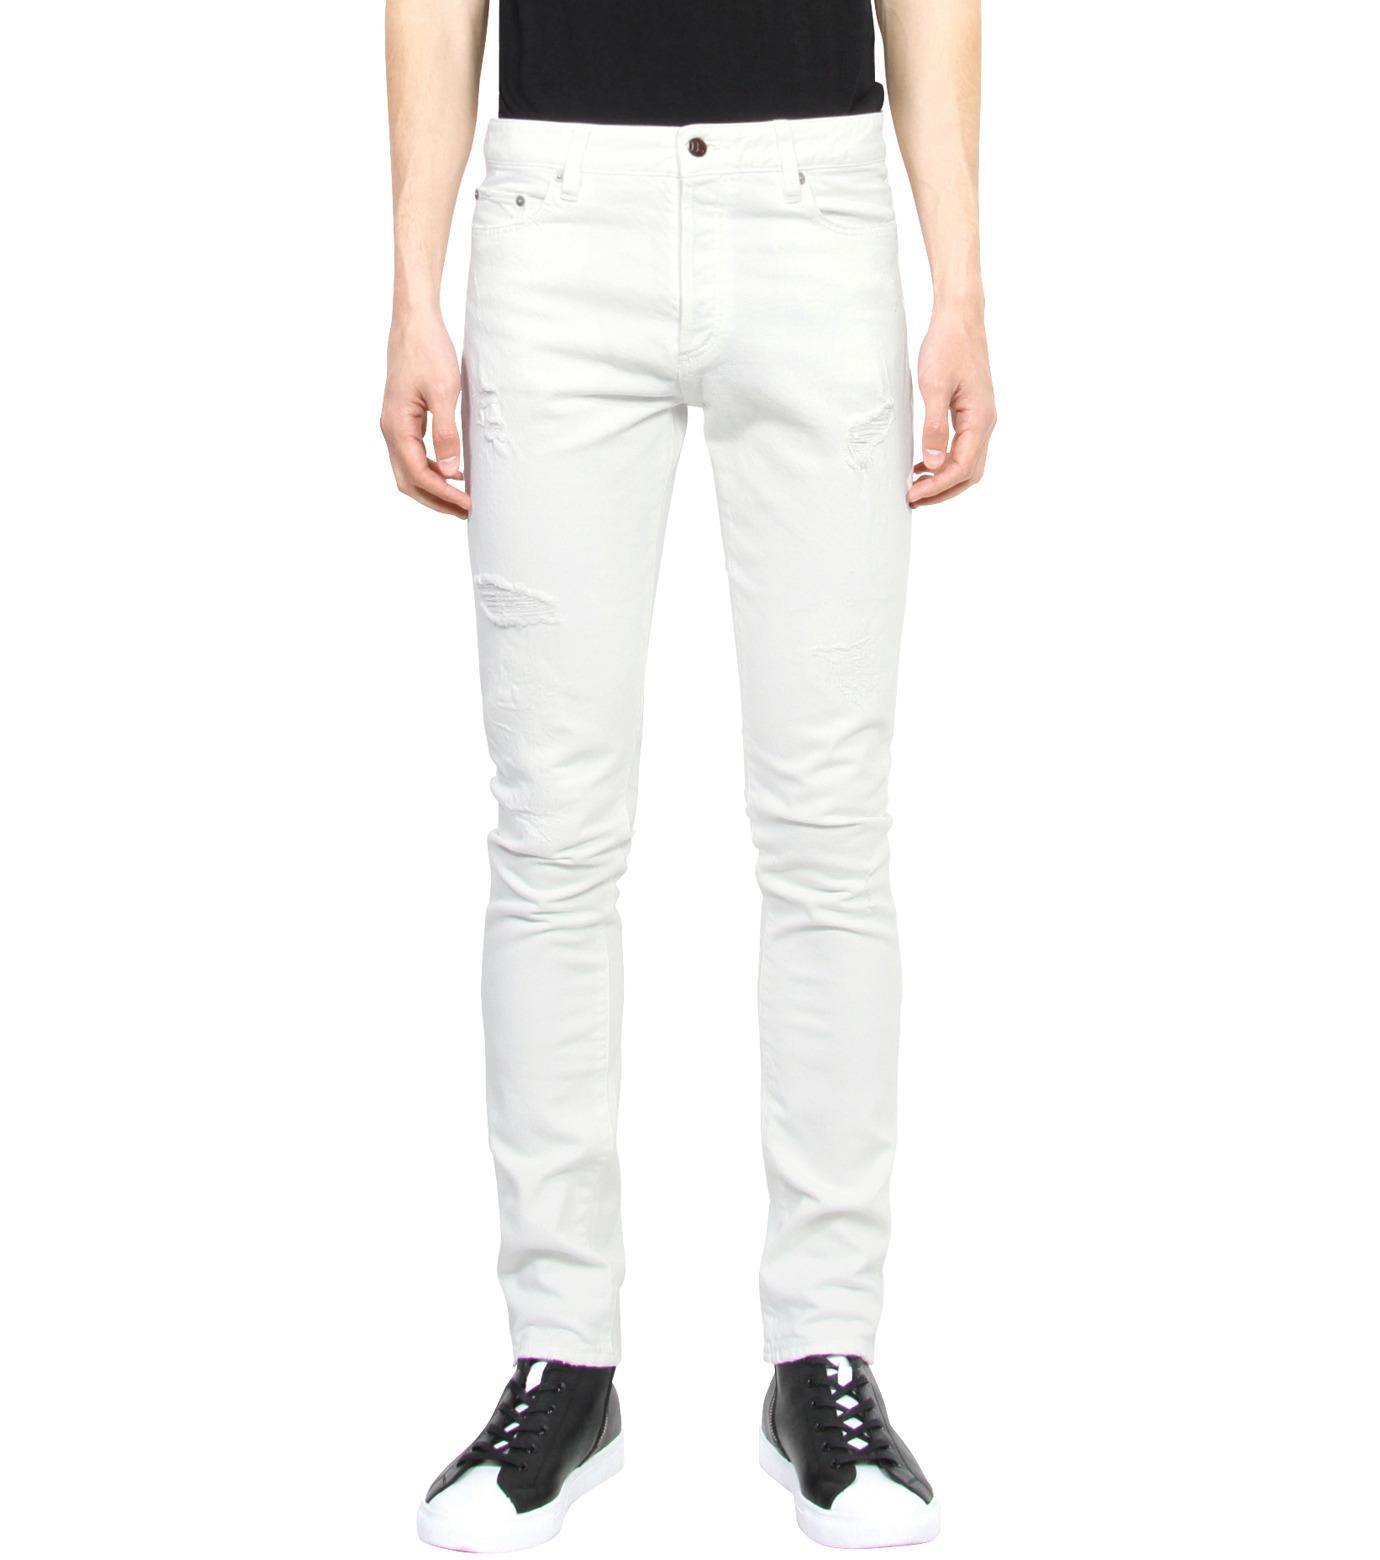 HL HEDDIE LOVU(エイチエル・エディールーヴ)のWhite Damage Denim-WHITE(パンツ/pants)-17S98002-4 拡大詳細画像1